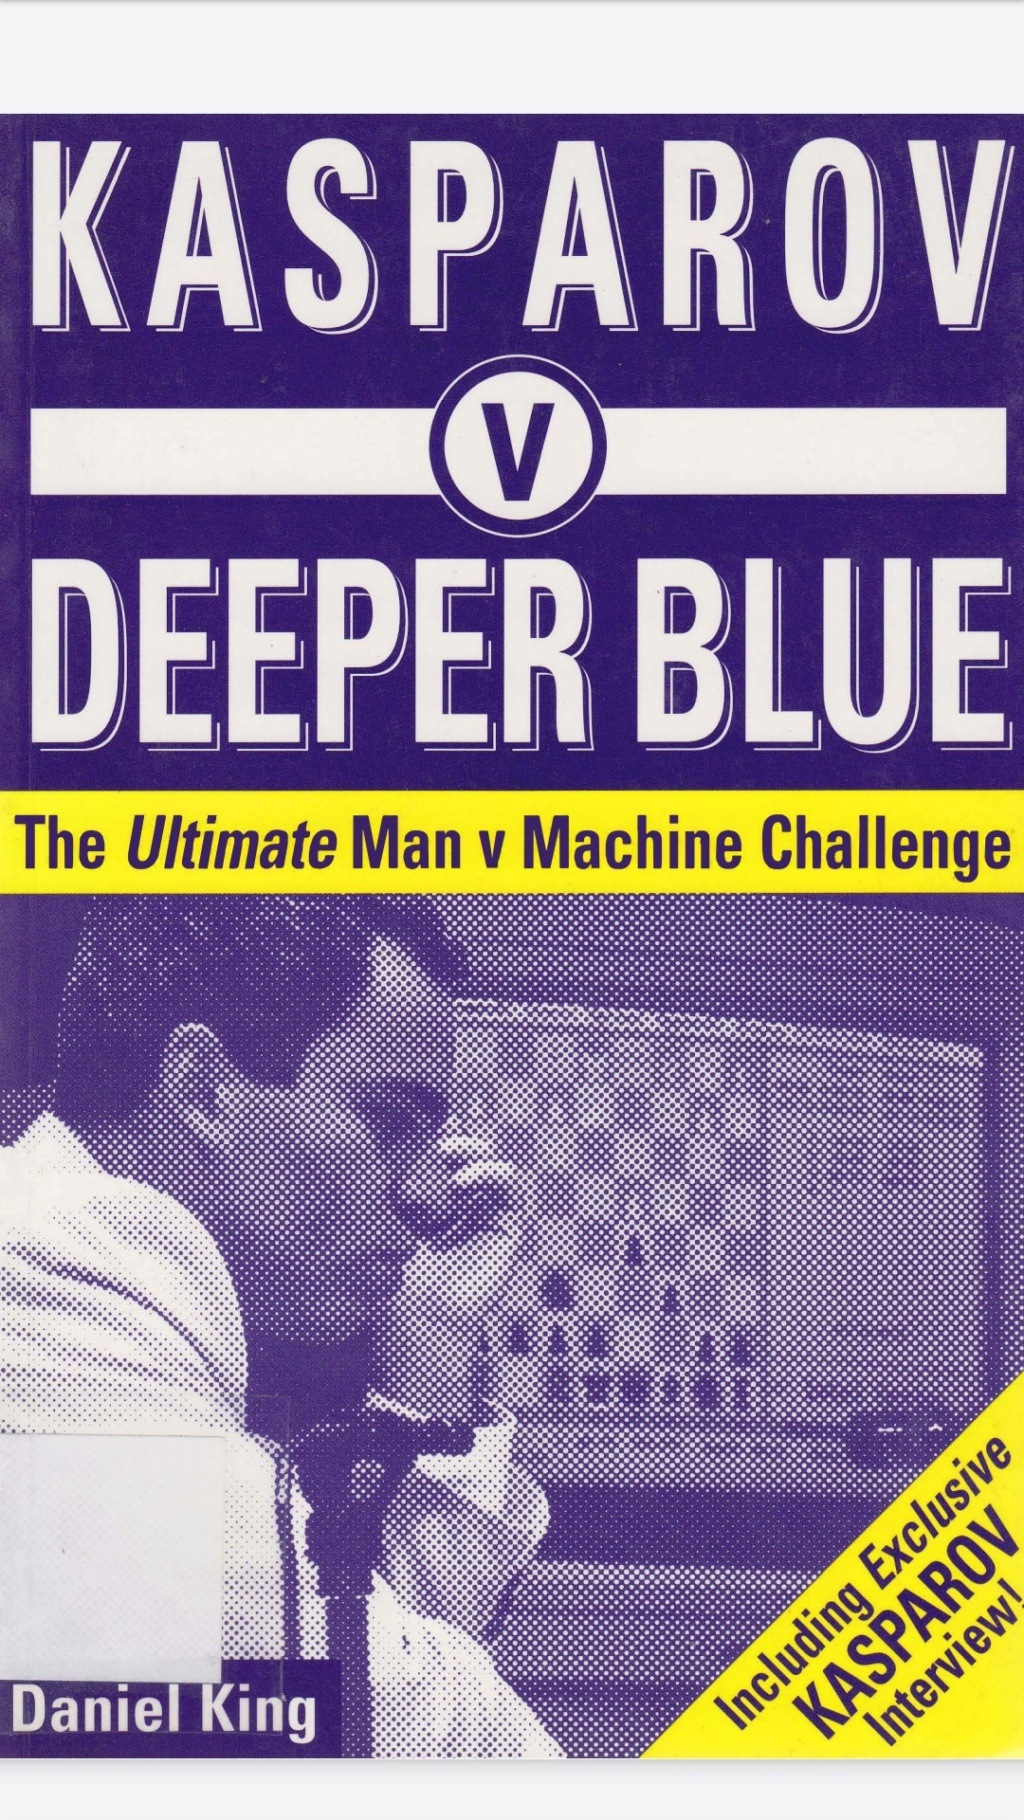 KASPAROV V DEEPER BLUE   Book by Daniel King Scree107